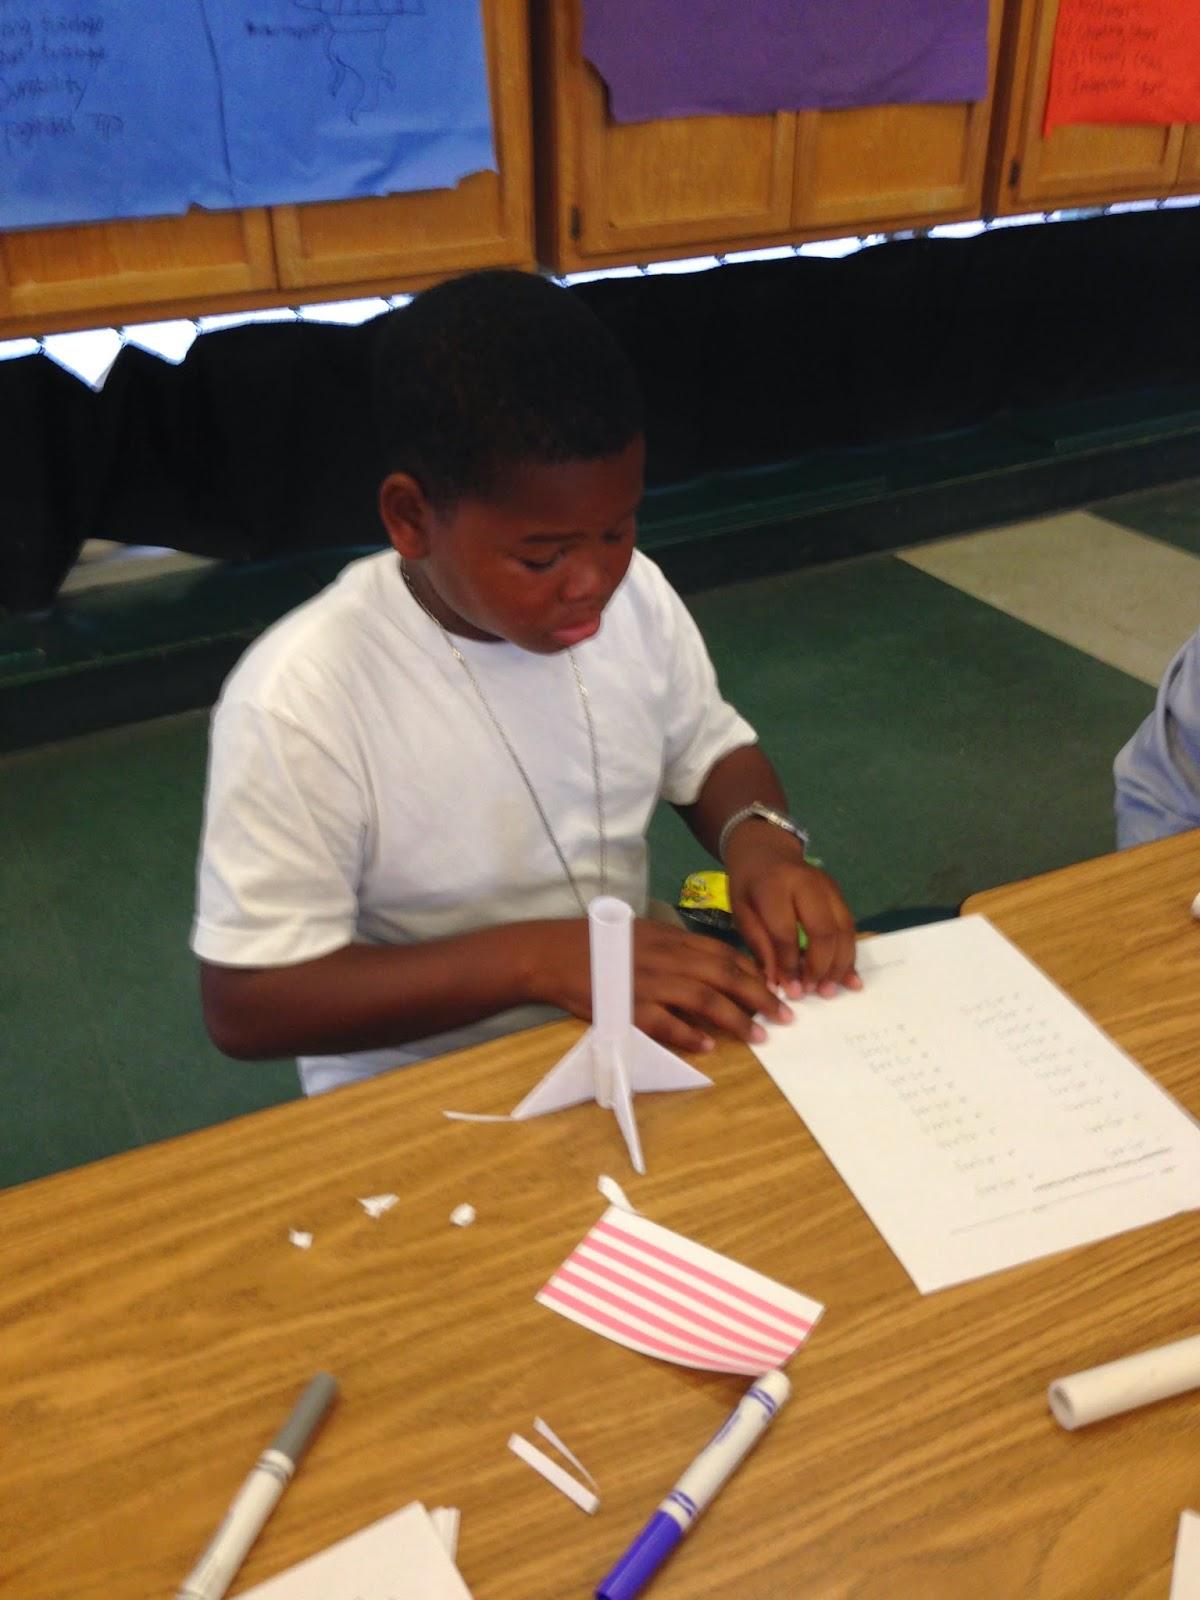 Stem Tastic After School Activities In Region 3 Summer Matters In Region 3